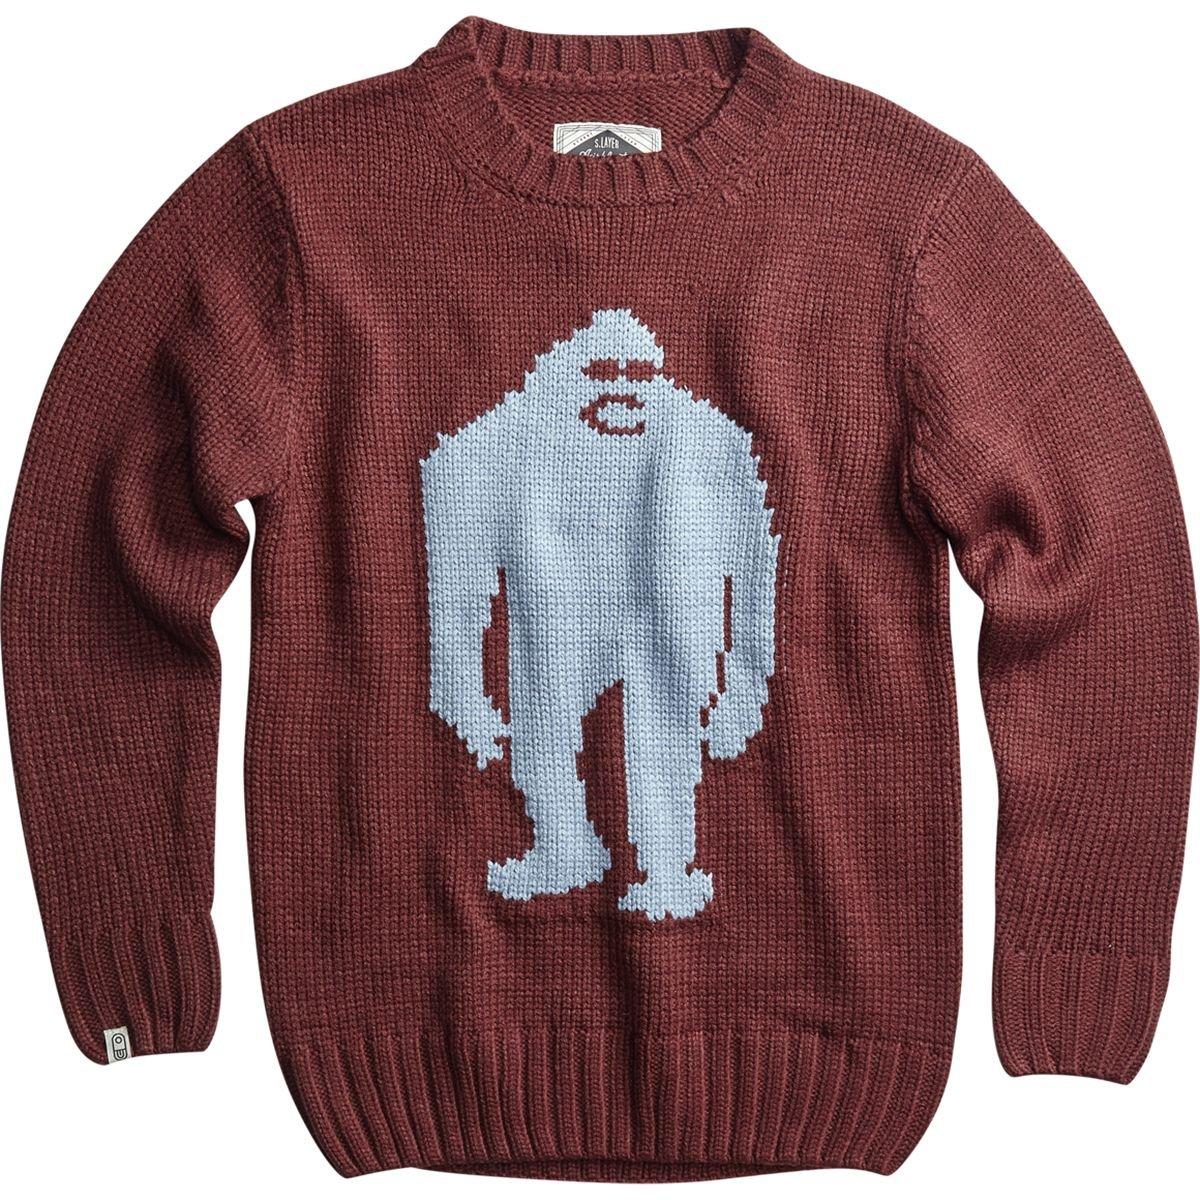 Airblaster OG Sassy Sweater mahogany